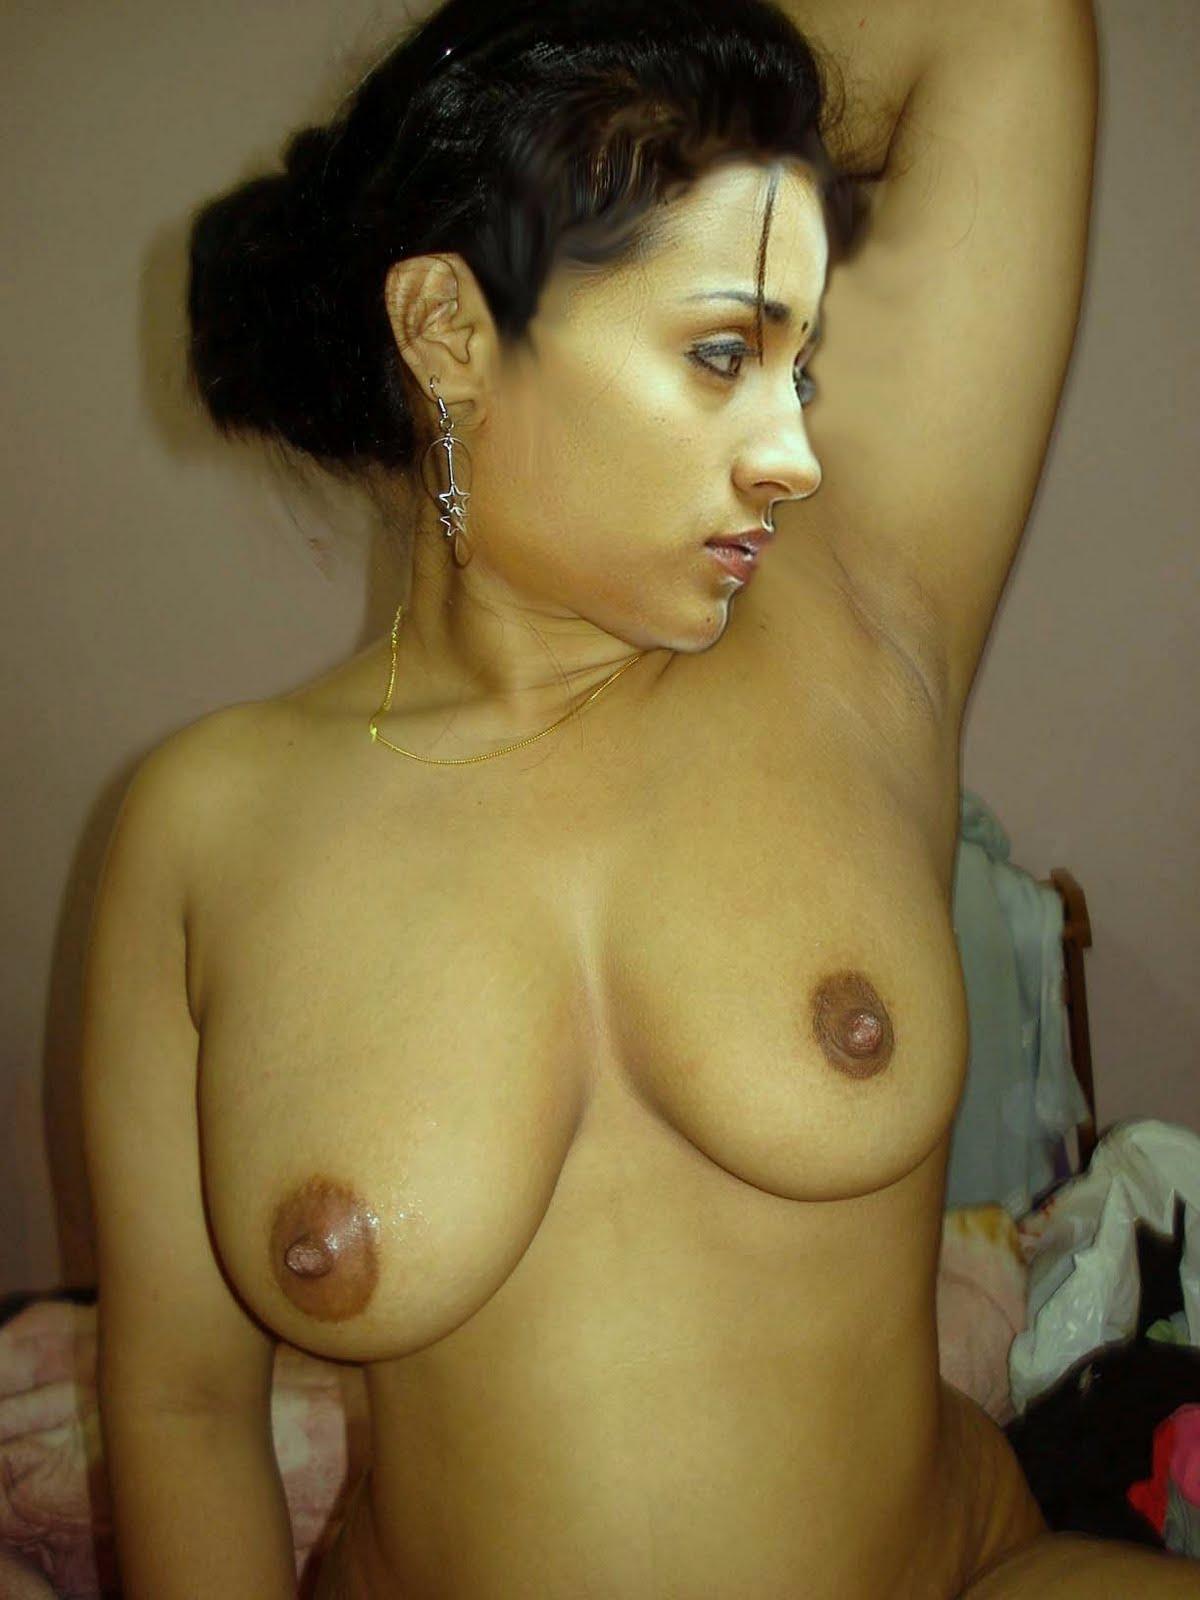 Guys sucking nude boobs erotic pictures